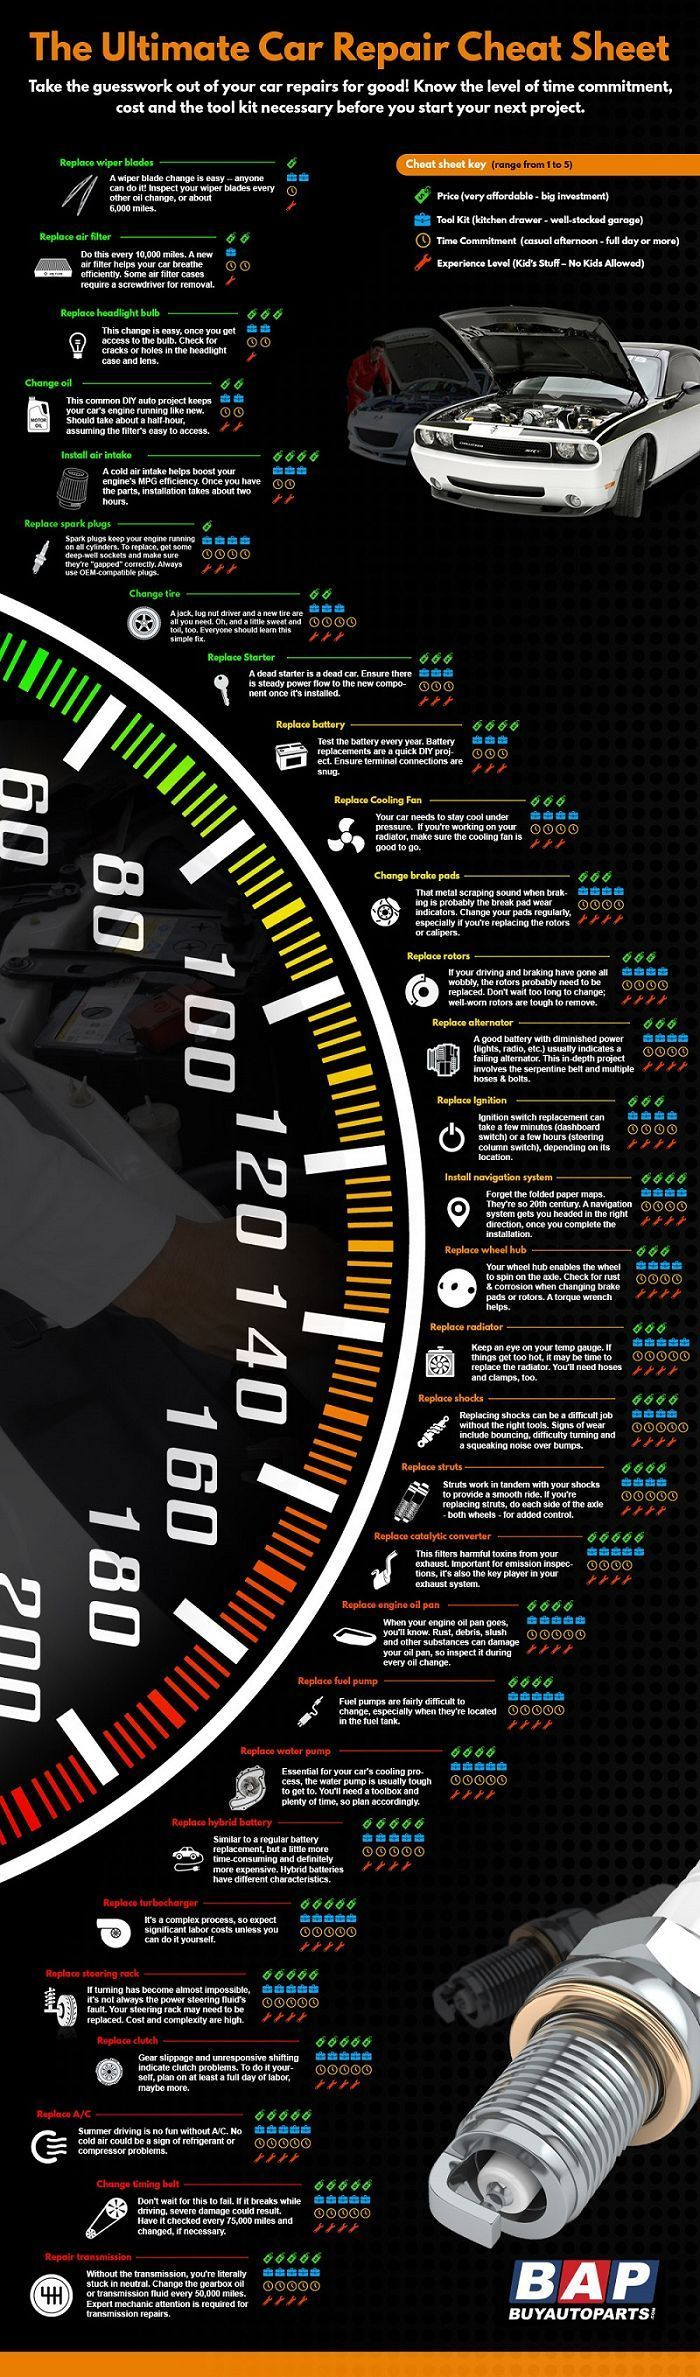 Infographic The Ultimate Car Repair Cheat Sheet Diy Care Car Maintenance Car Hacks Cars